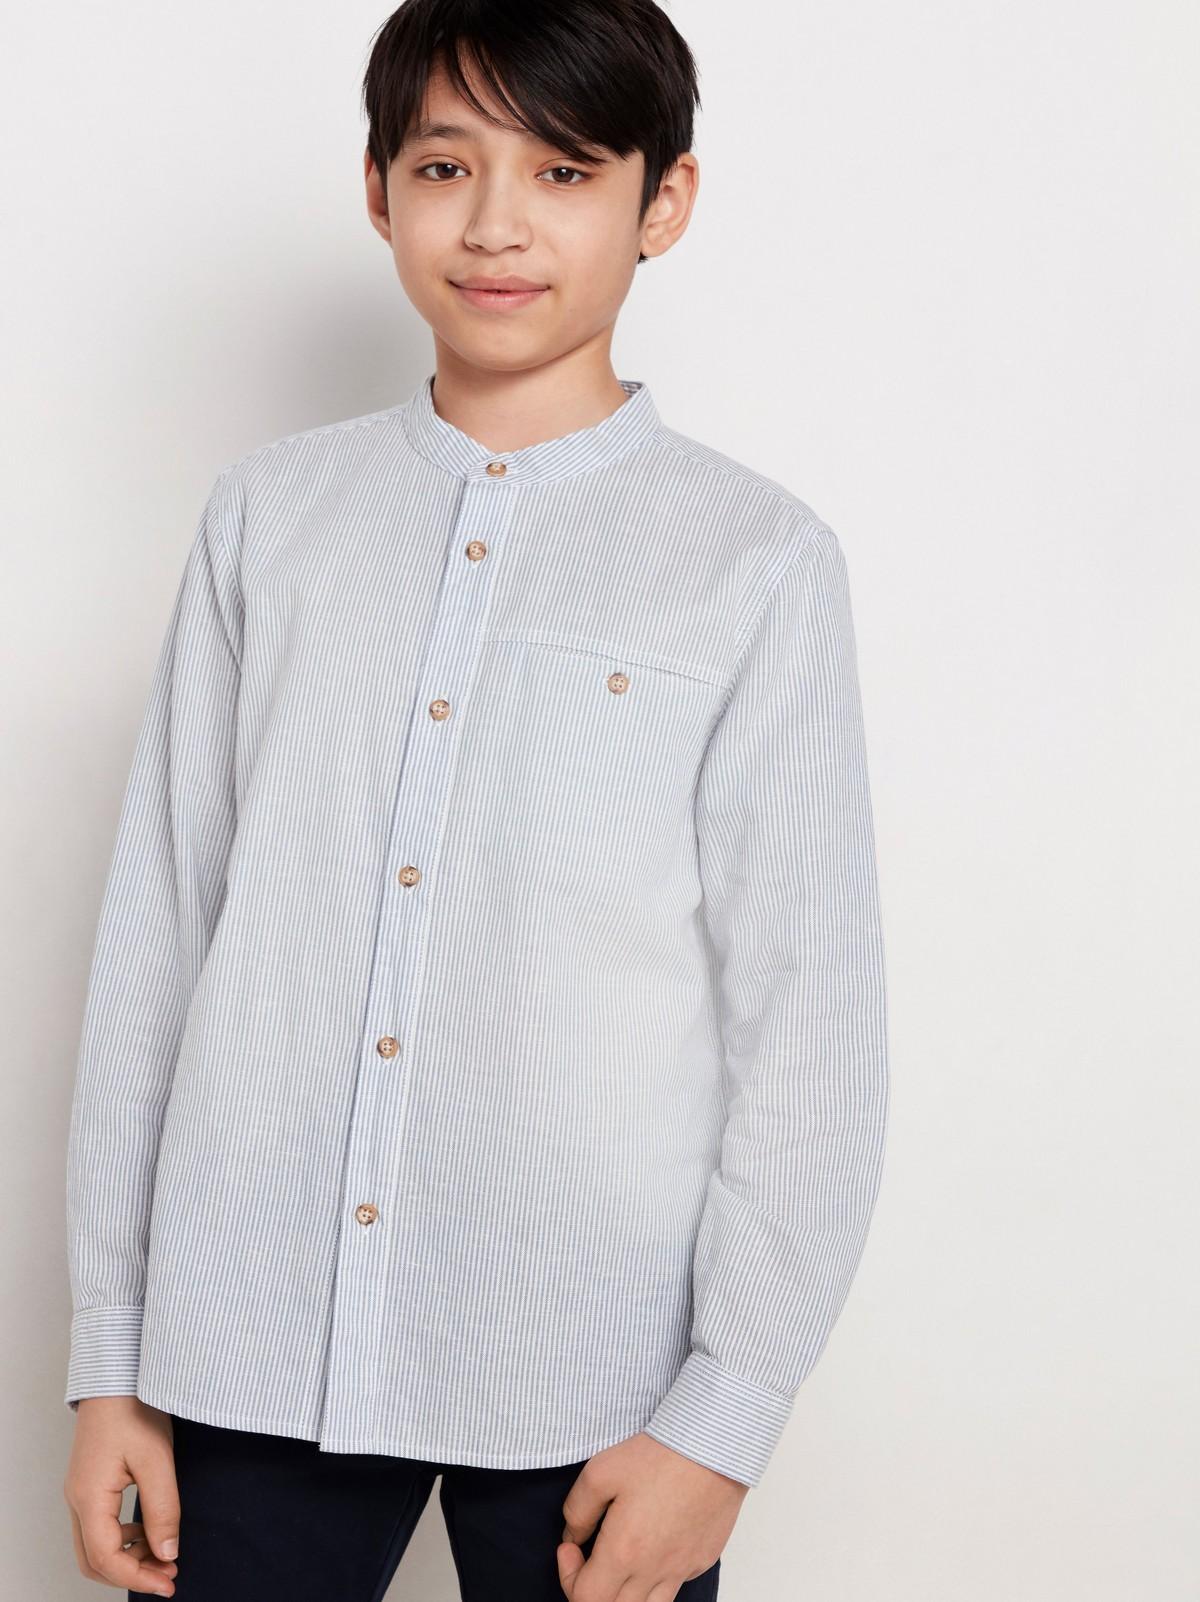 Stripete, krageløs skjorte i linblanding | Lindex